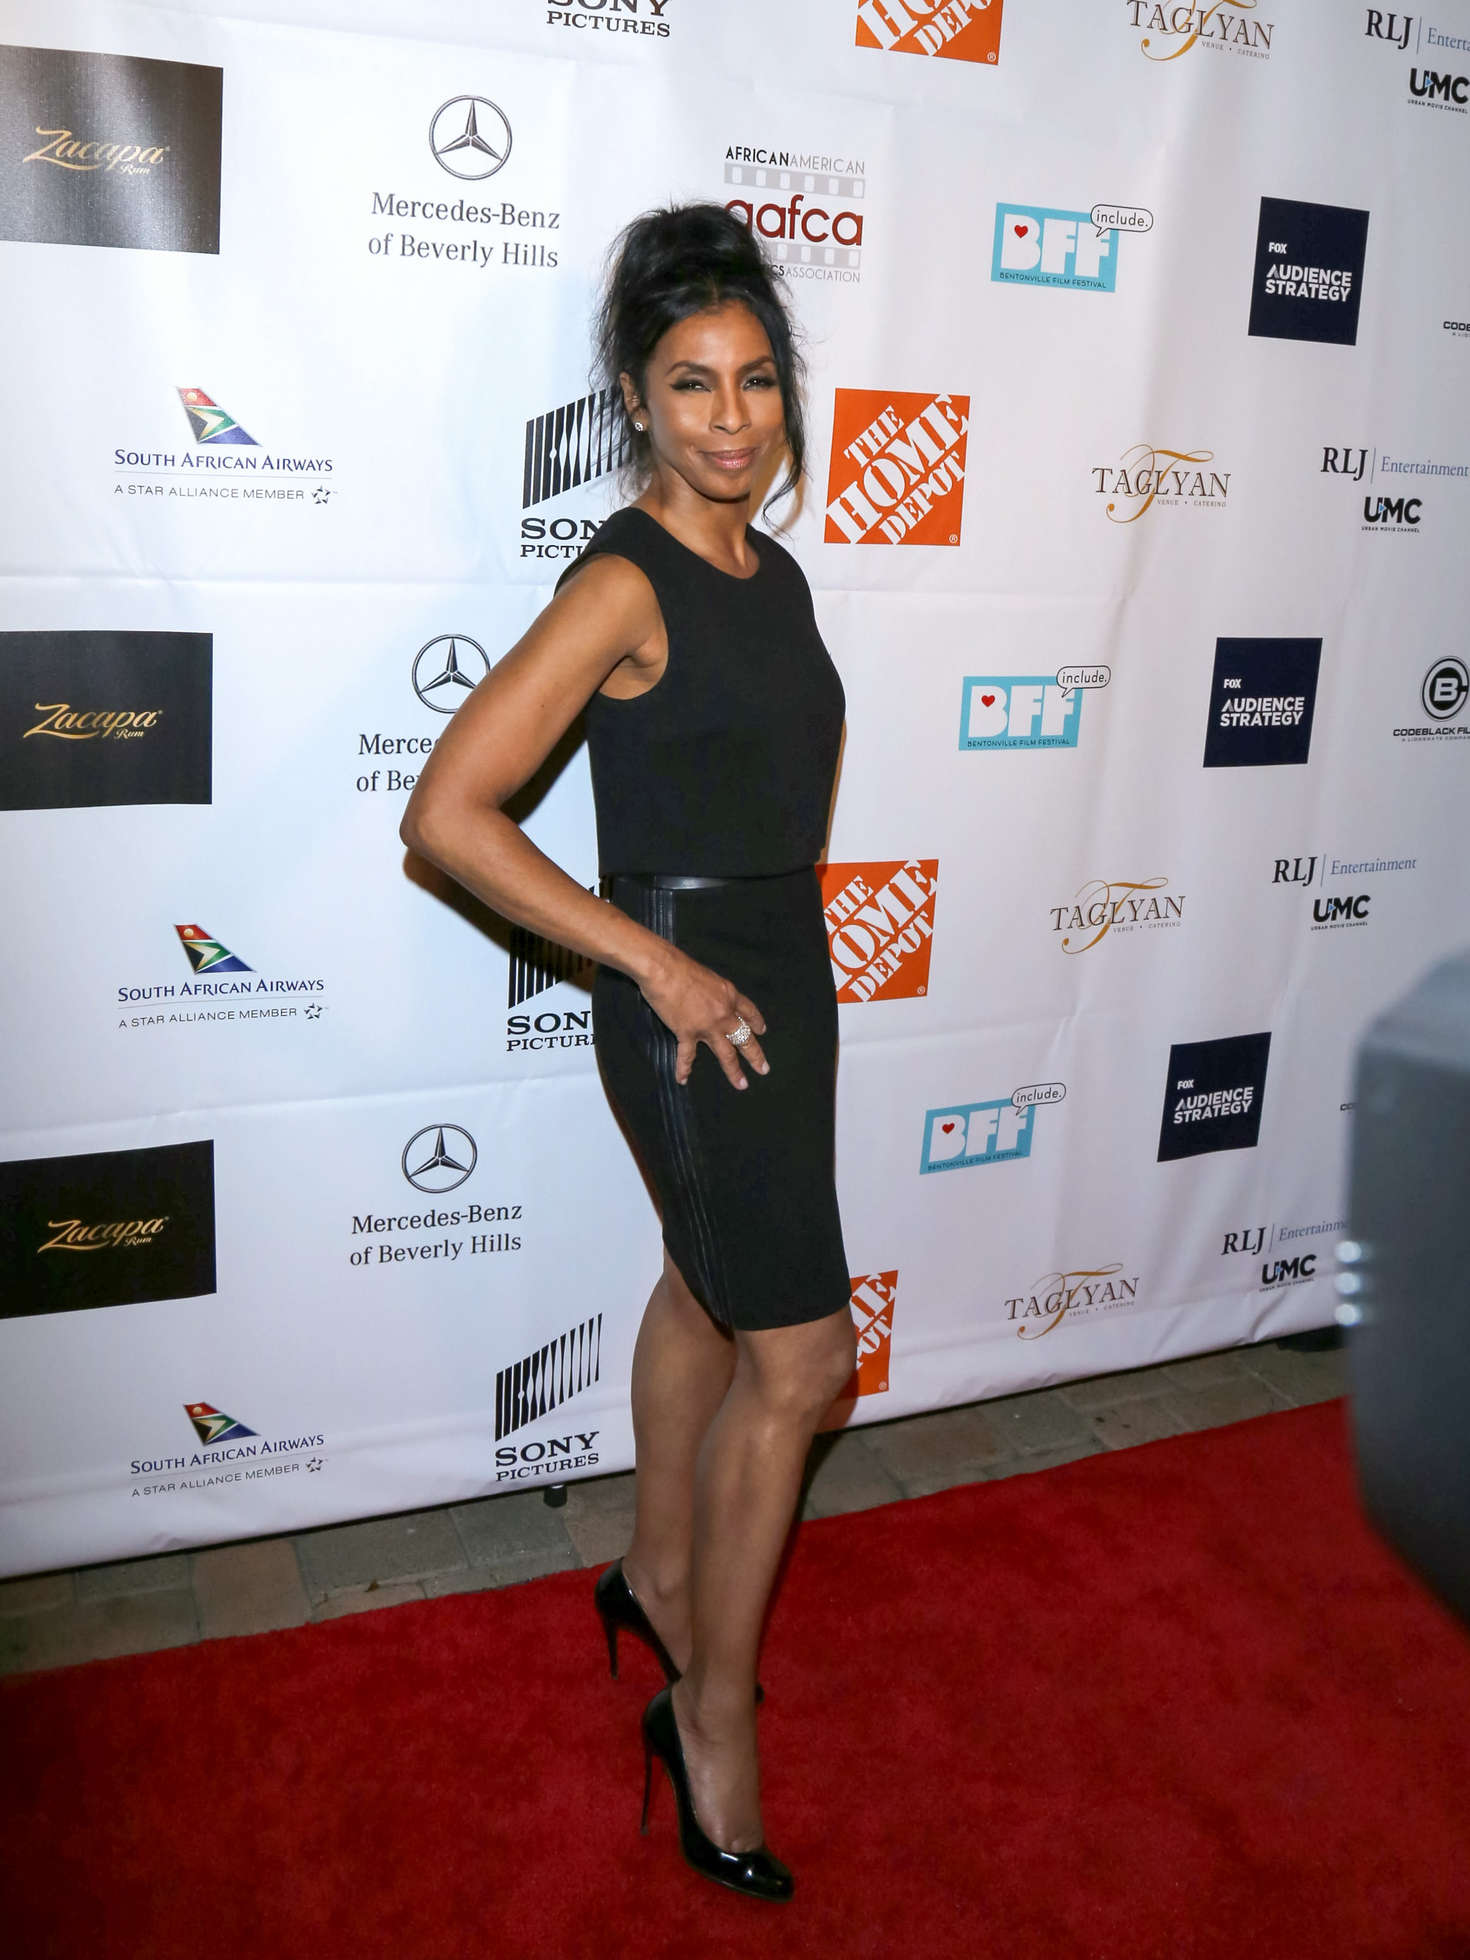 Khandi Alexander Annual African American Film Critics Association Awards in Los Angeles